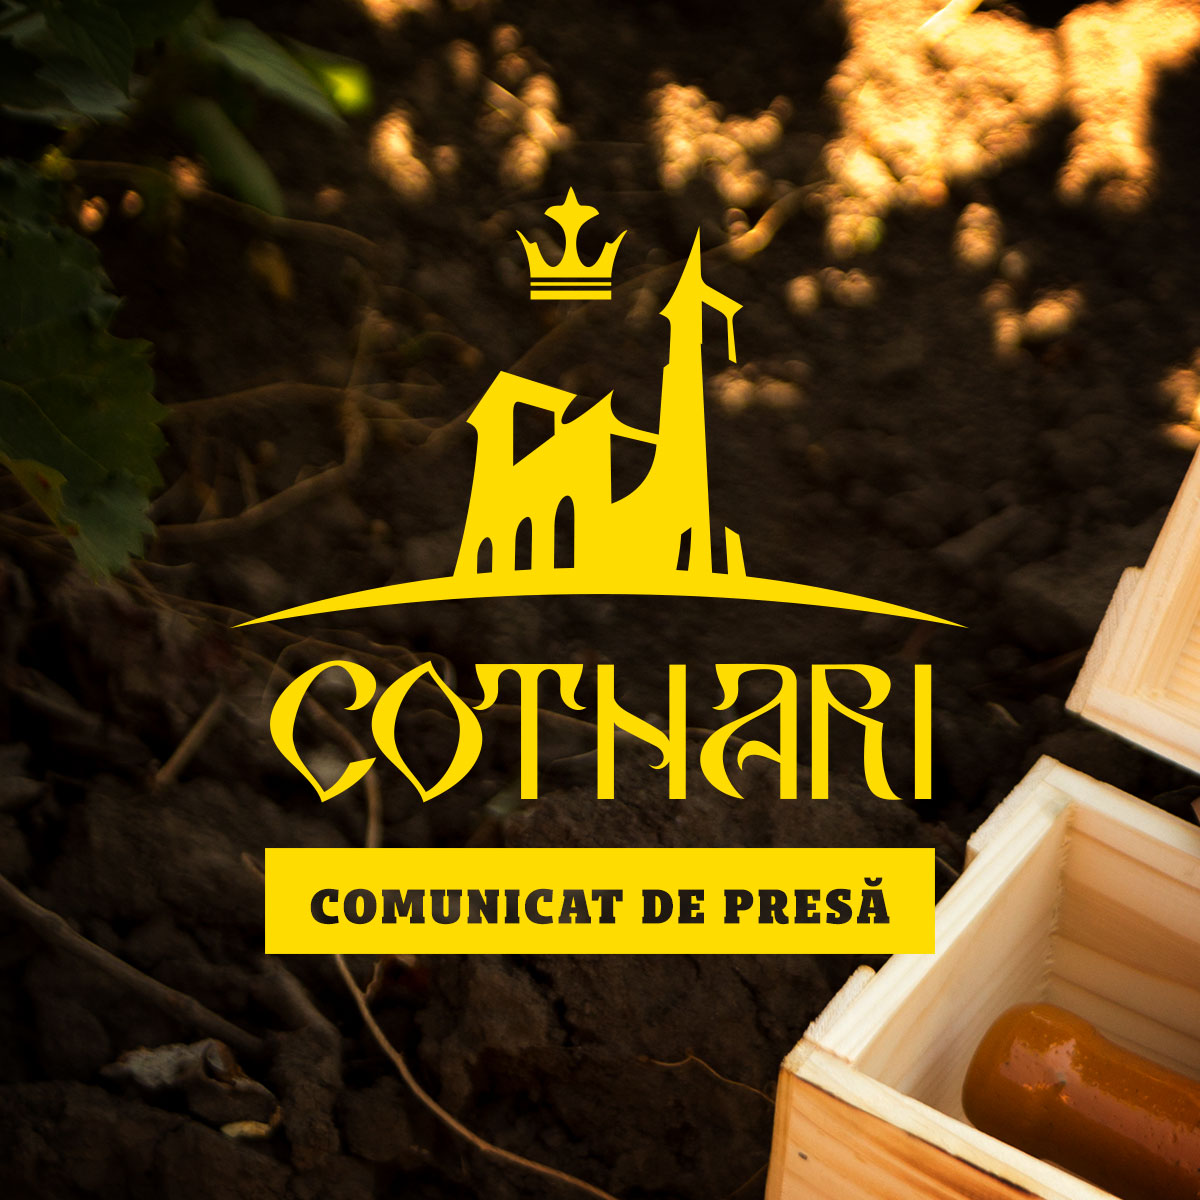 https://www.cotnari.ro/continut/uploads/2017/08/comunicat20.jpg